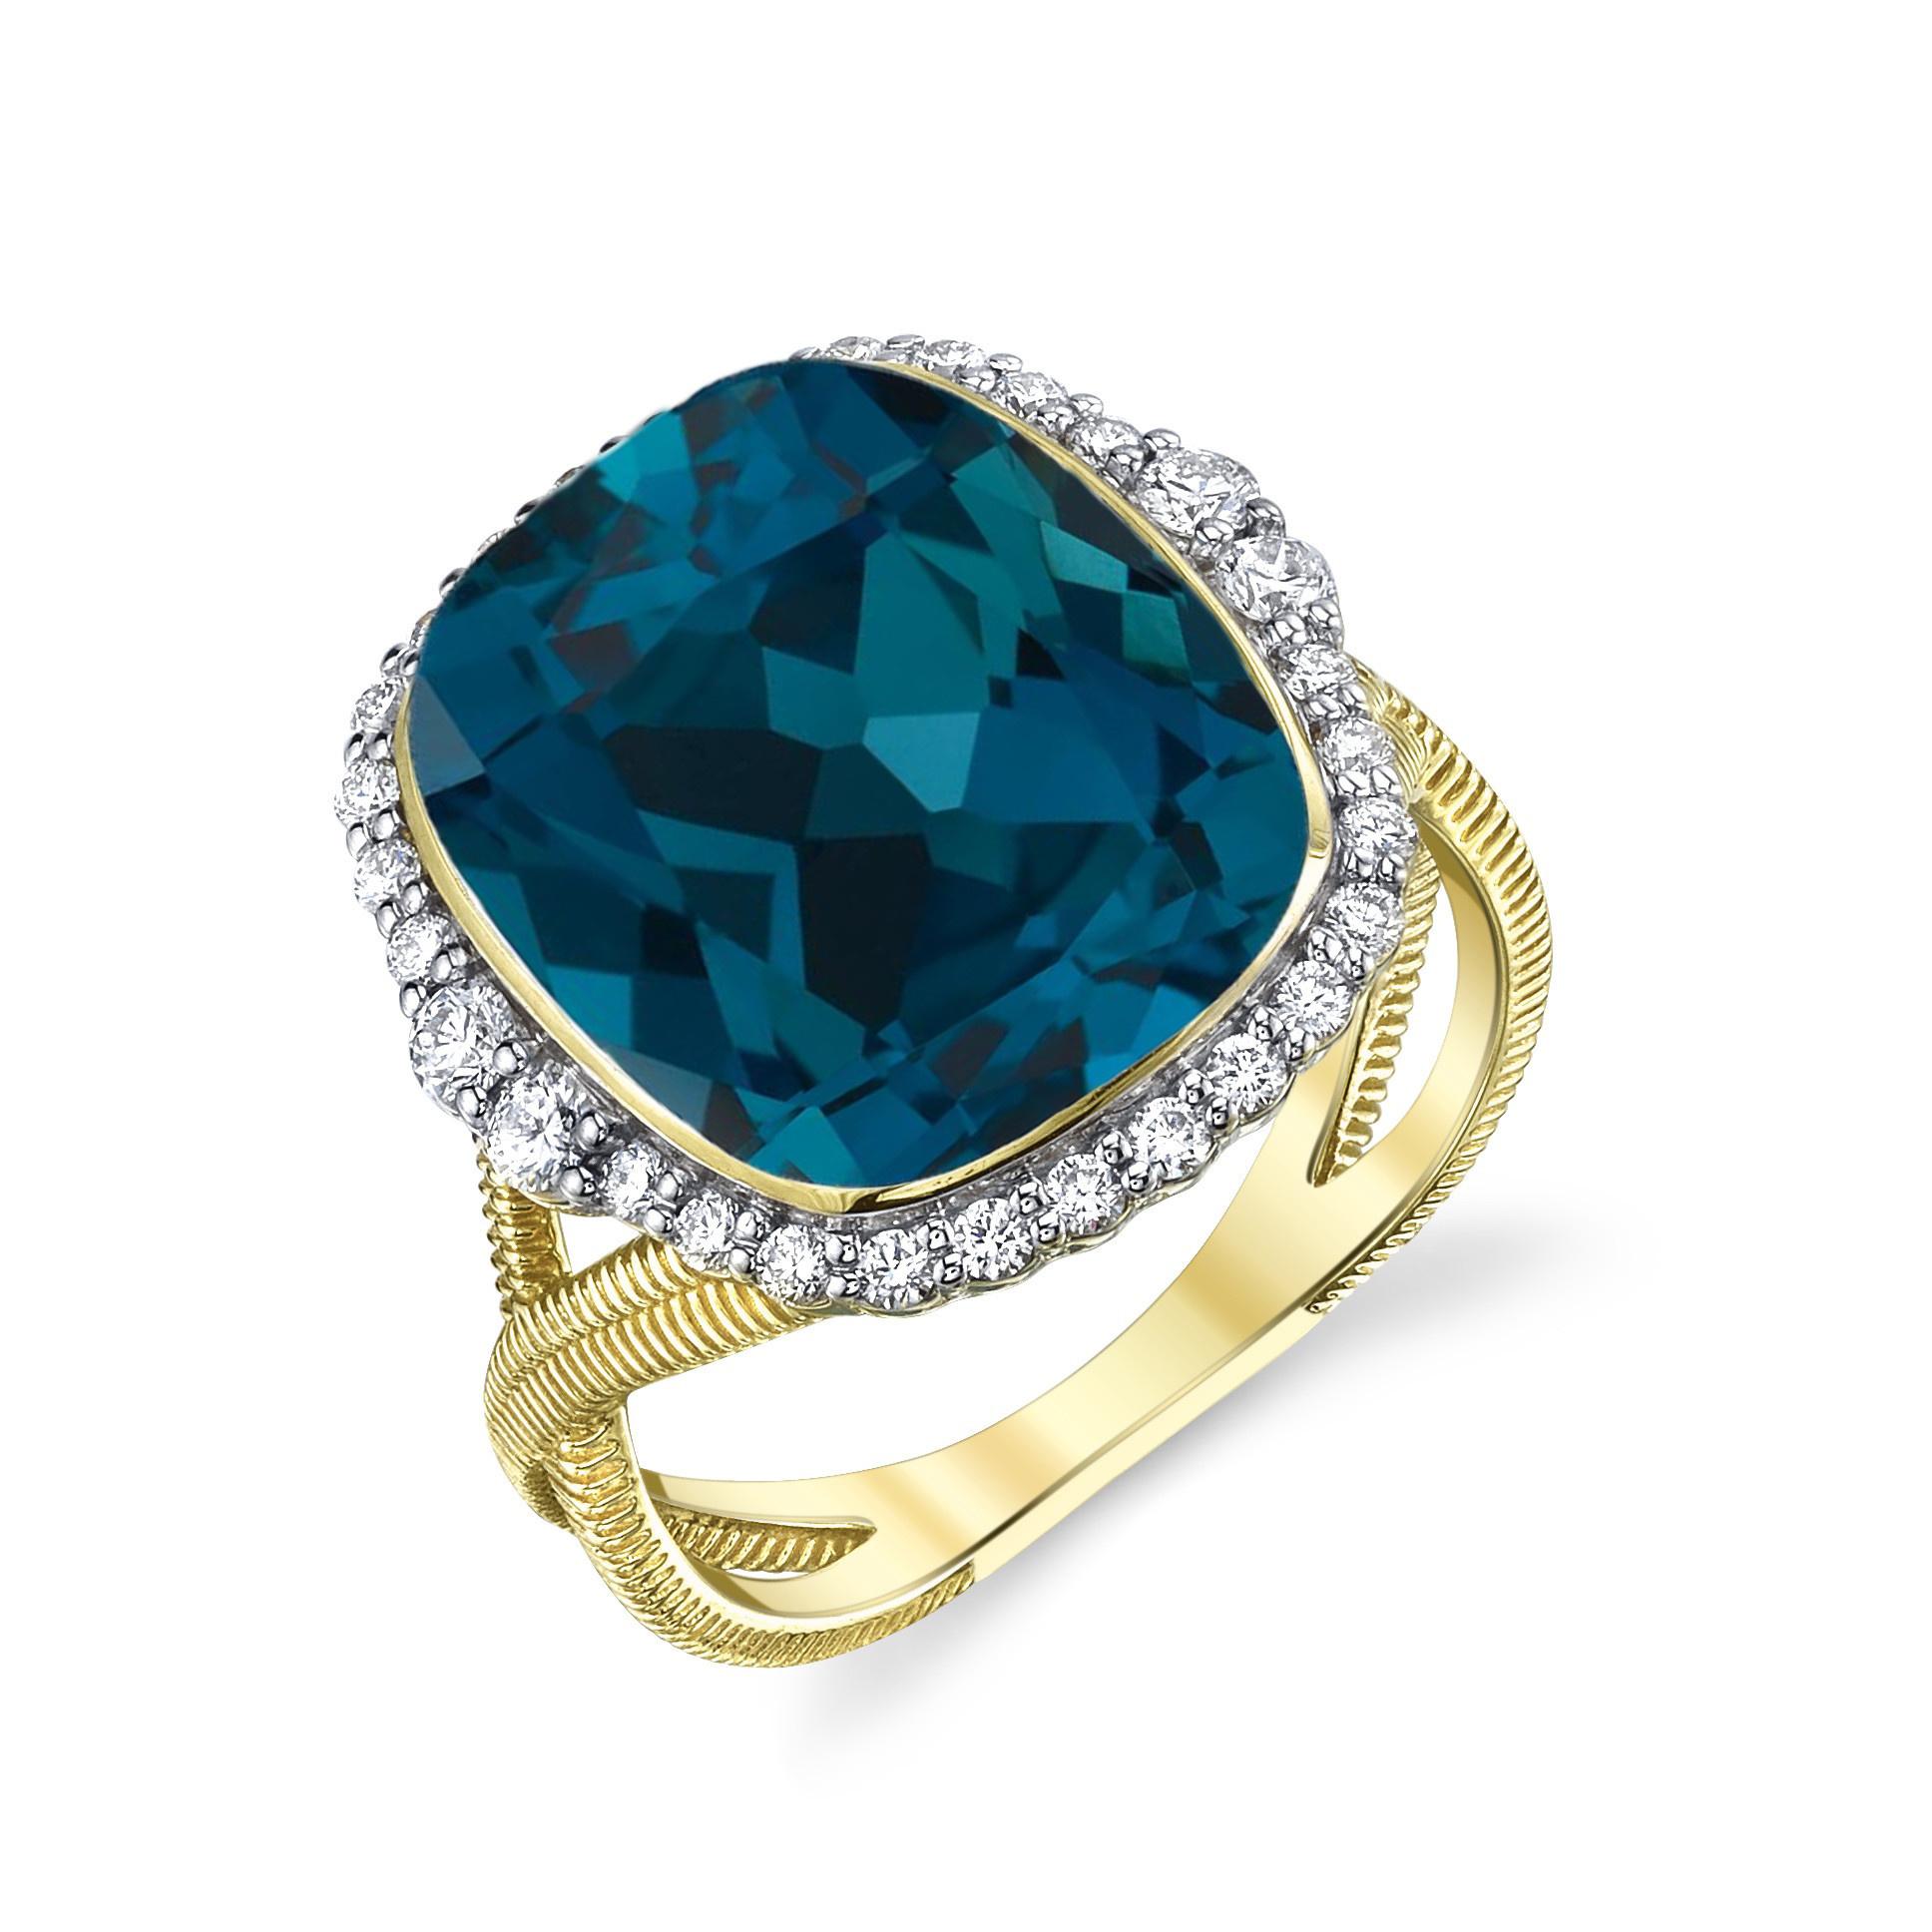 London Blue Topaz Ring with White Diamond Detail